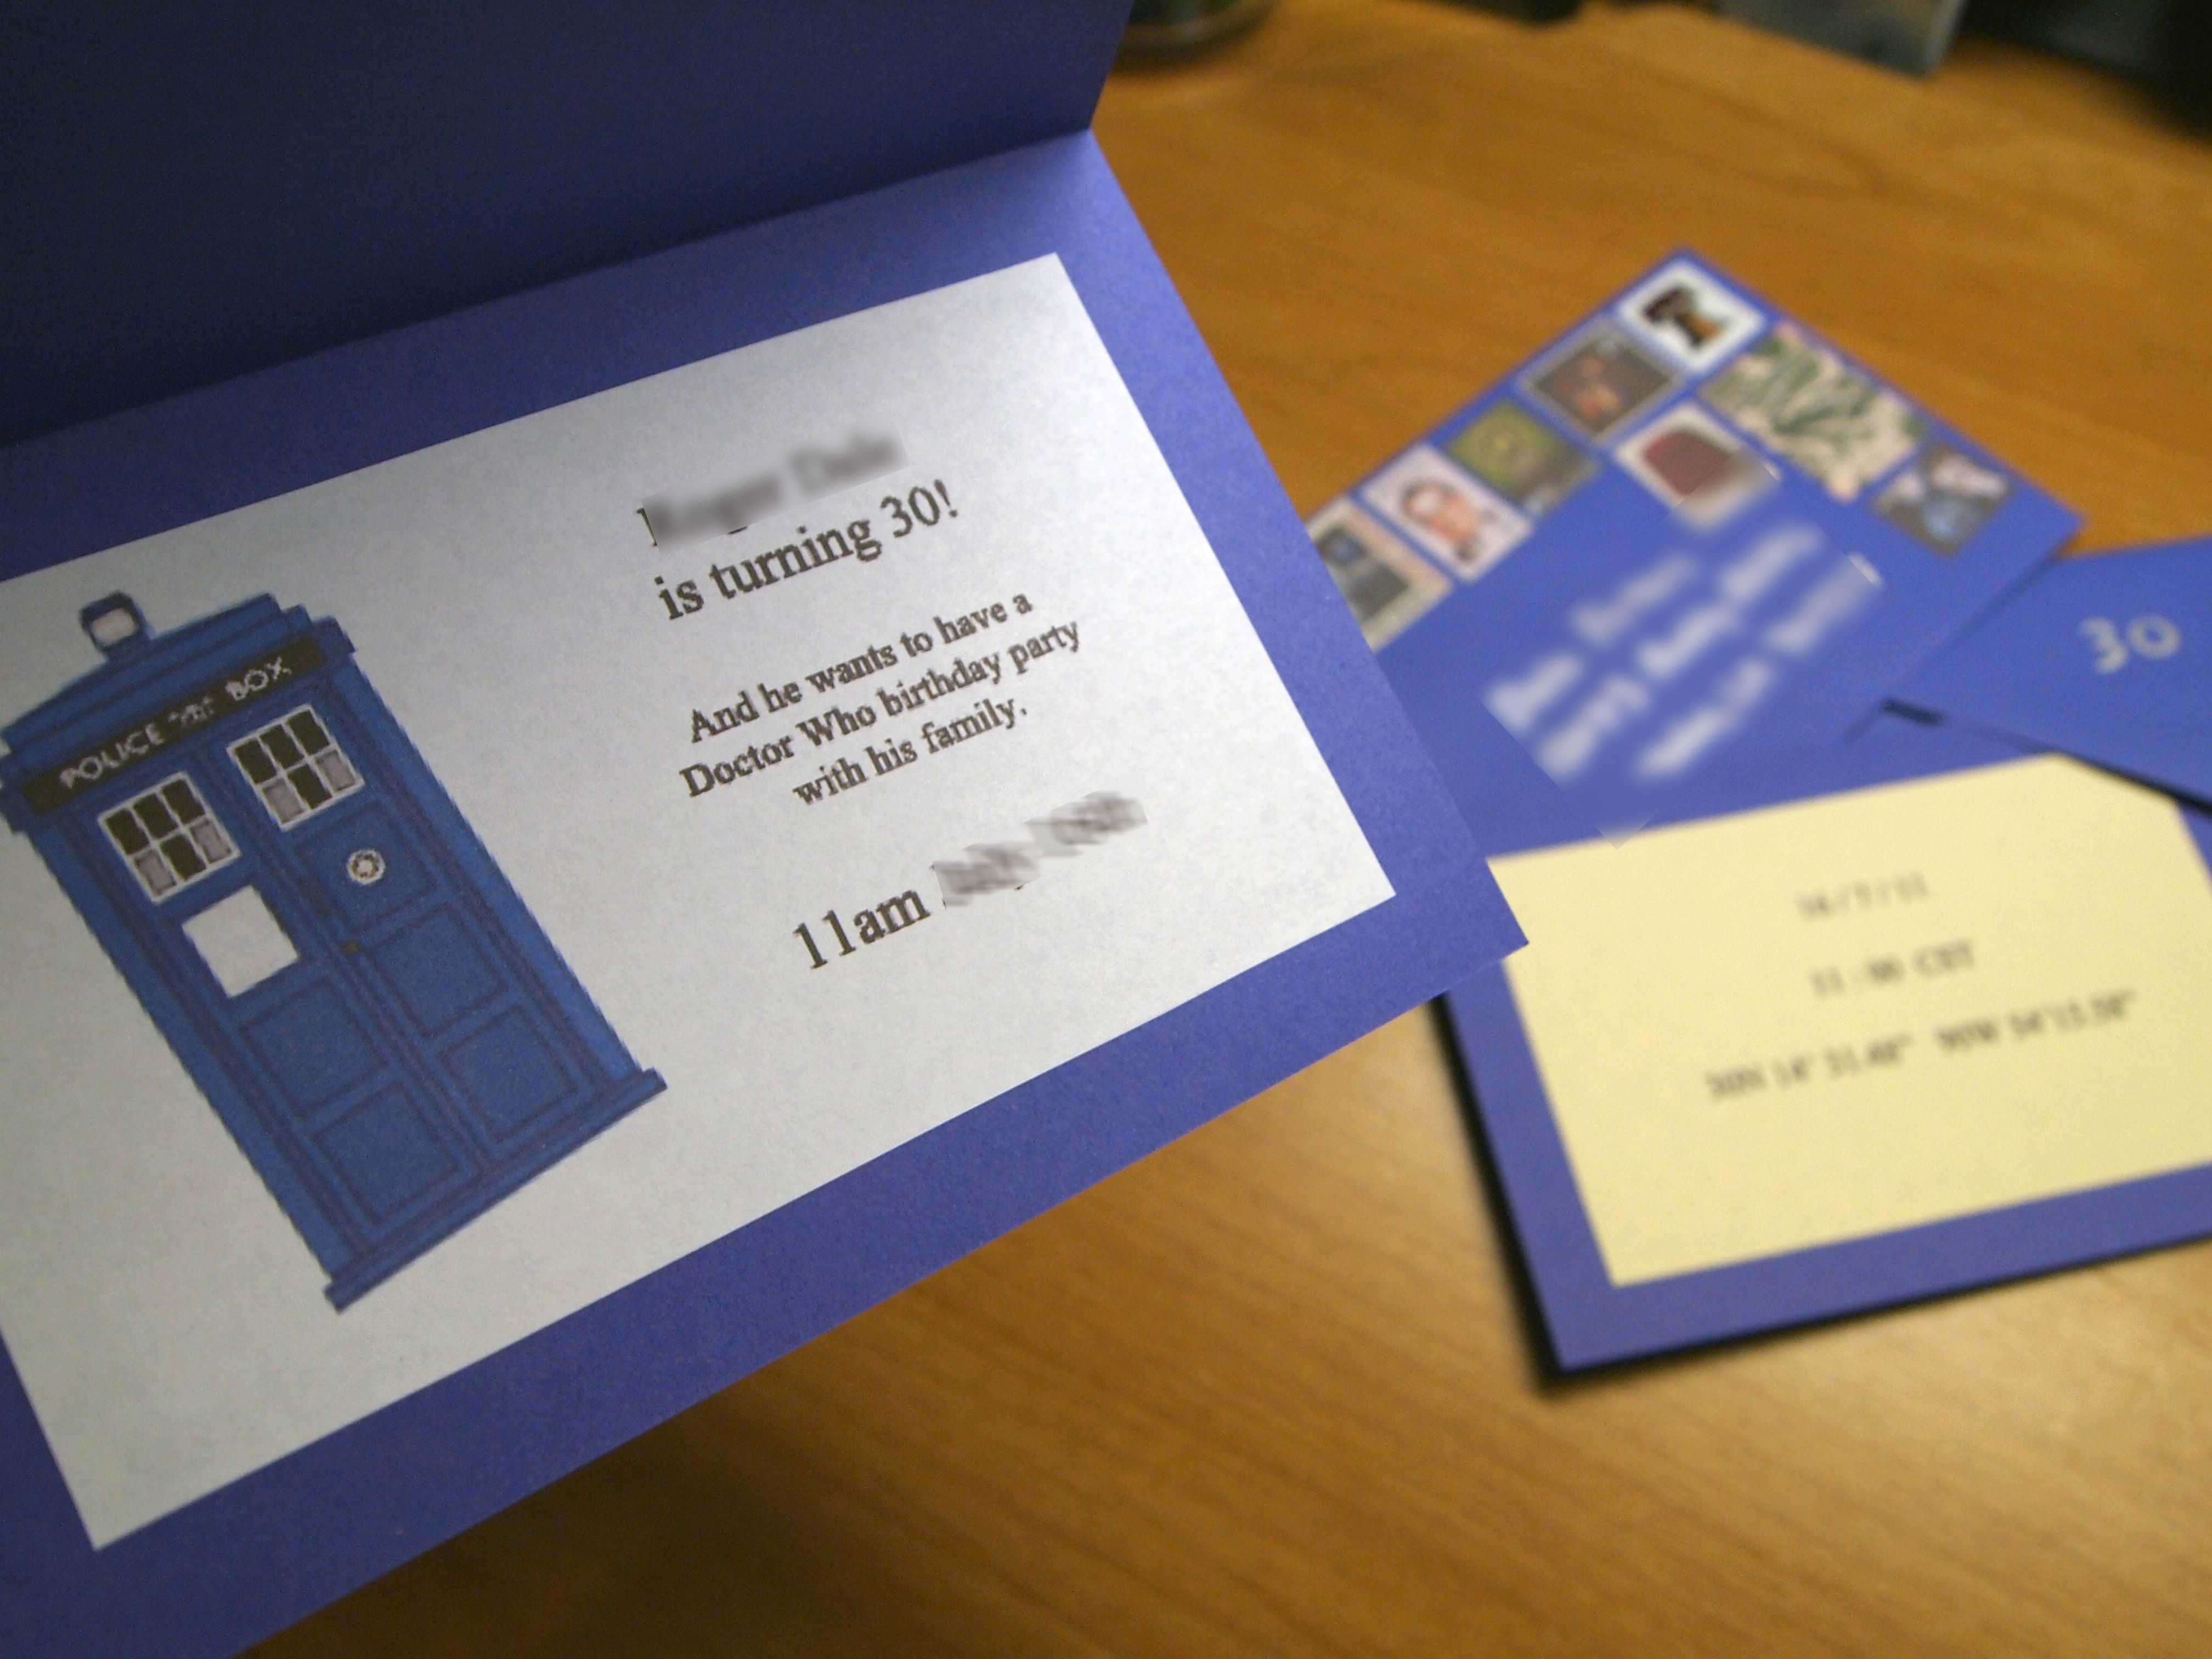 Doctor Who Invitations | Random Creativity - Doctor Who Party Invitations Printable Free